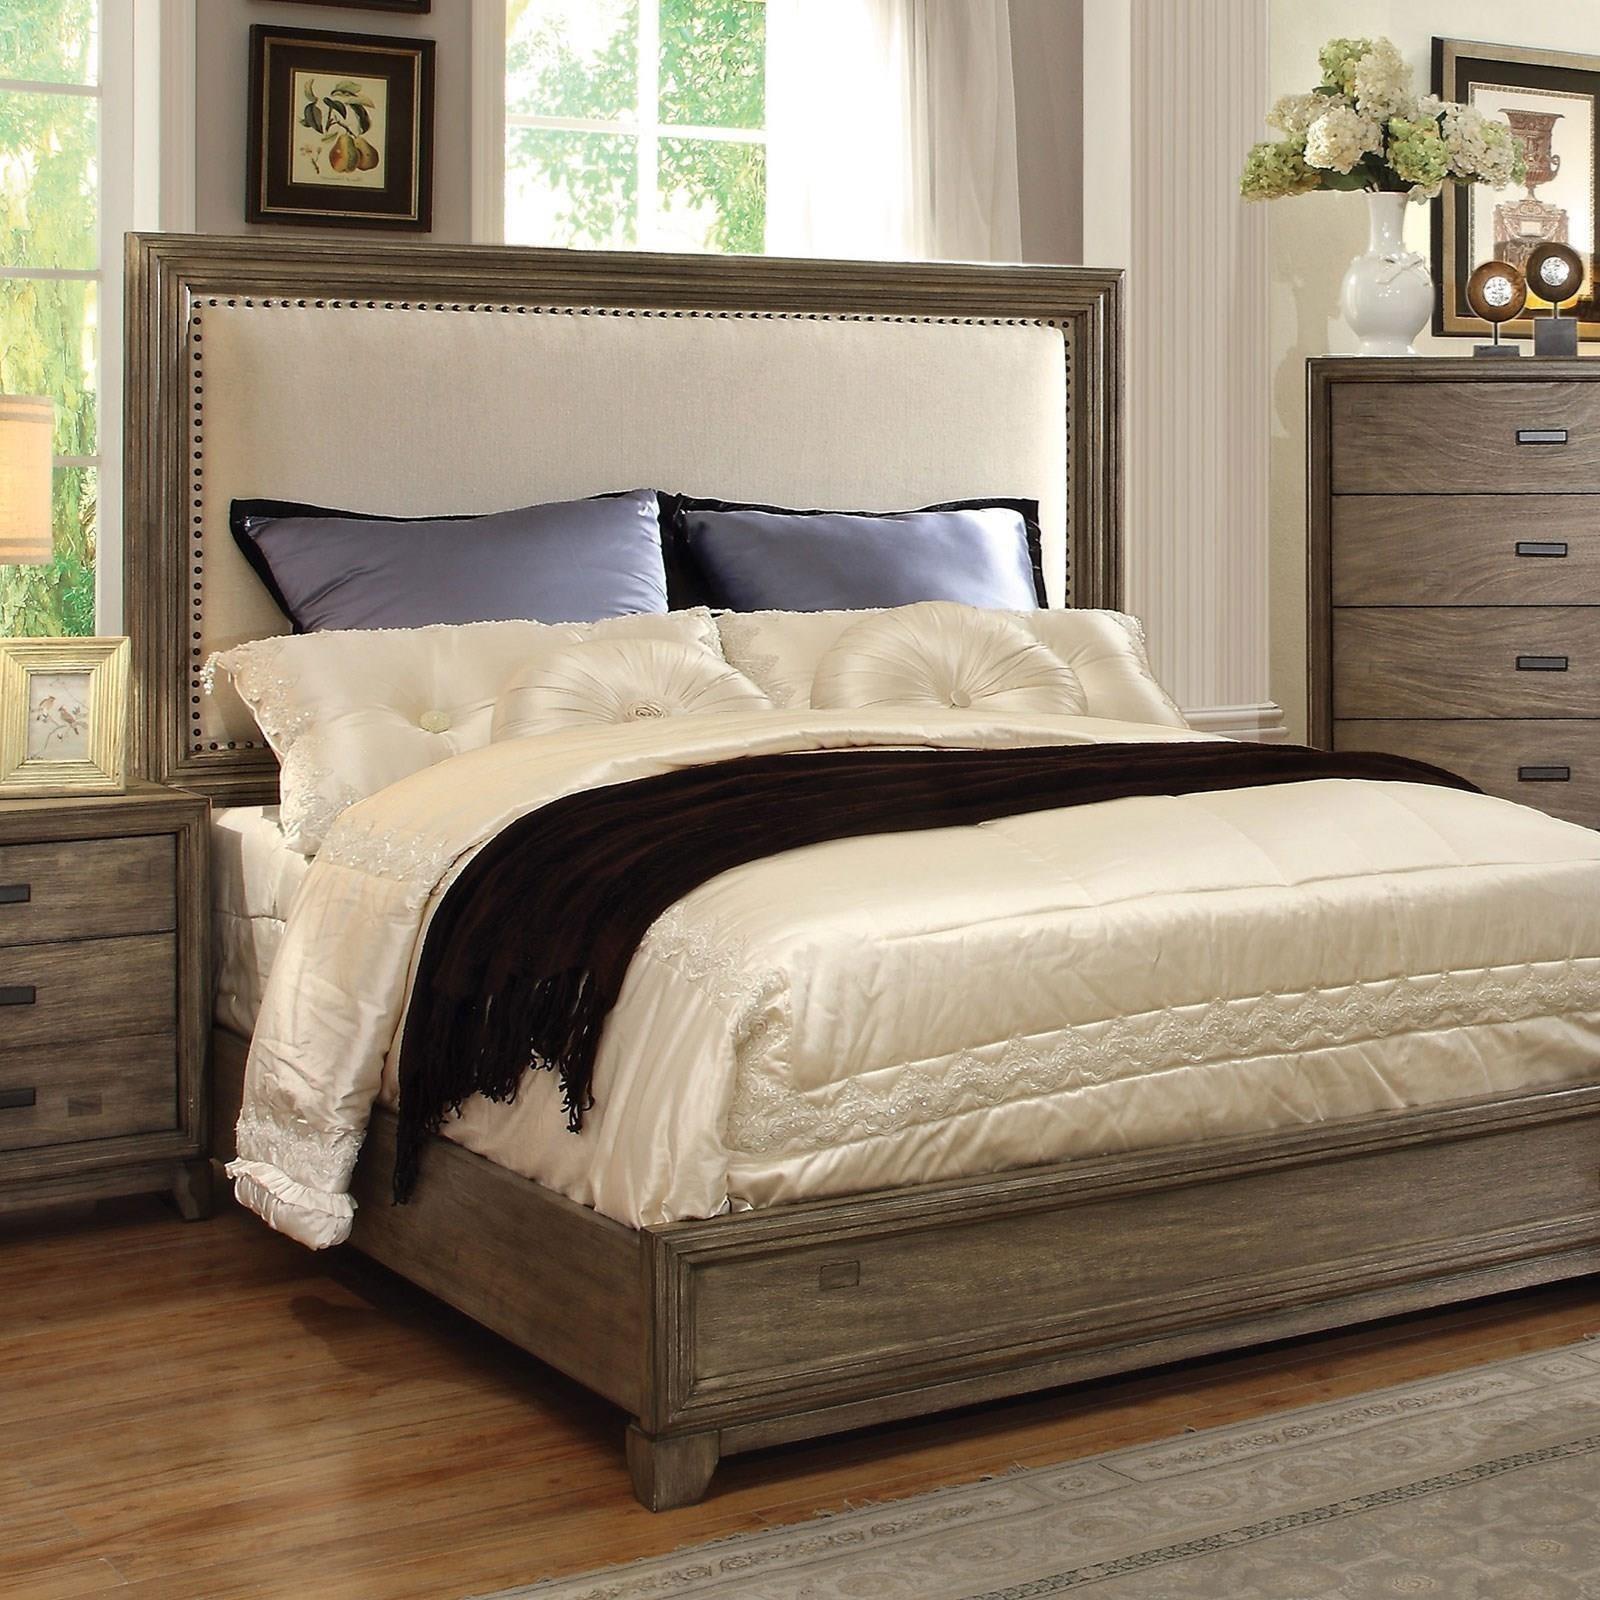 Antler California King Bed at Household Furniture